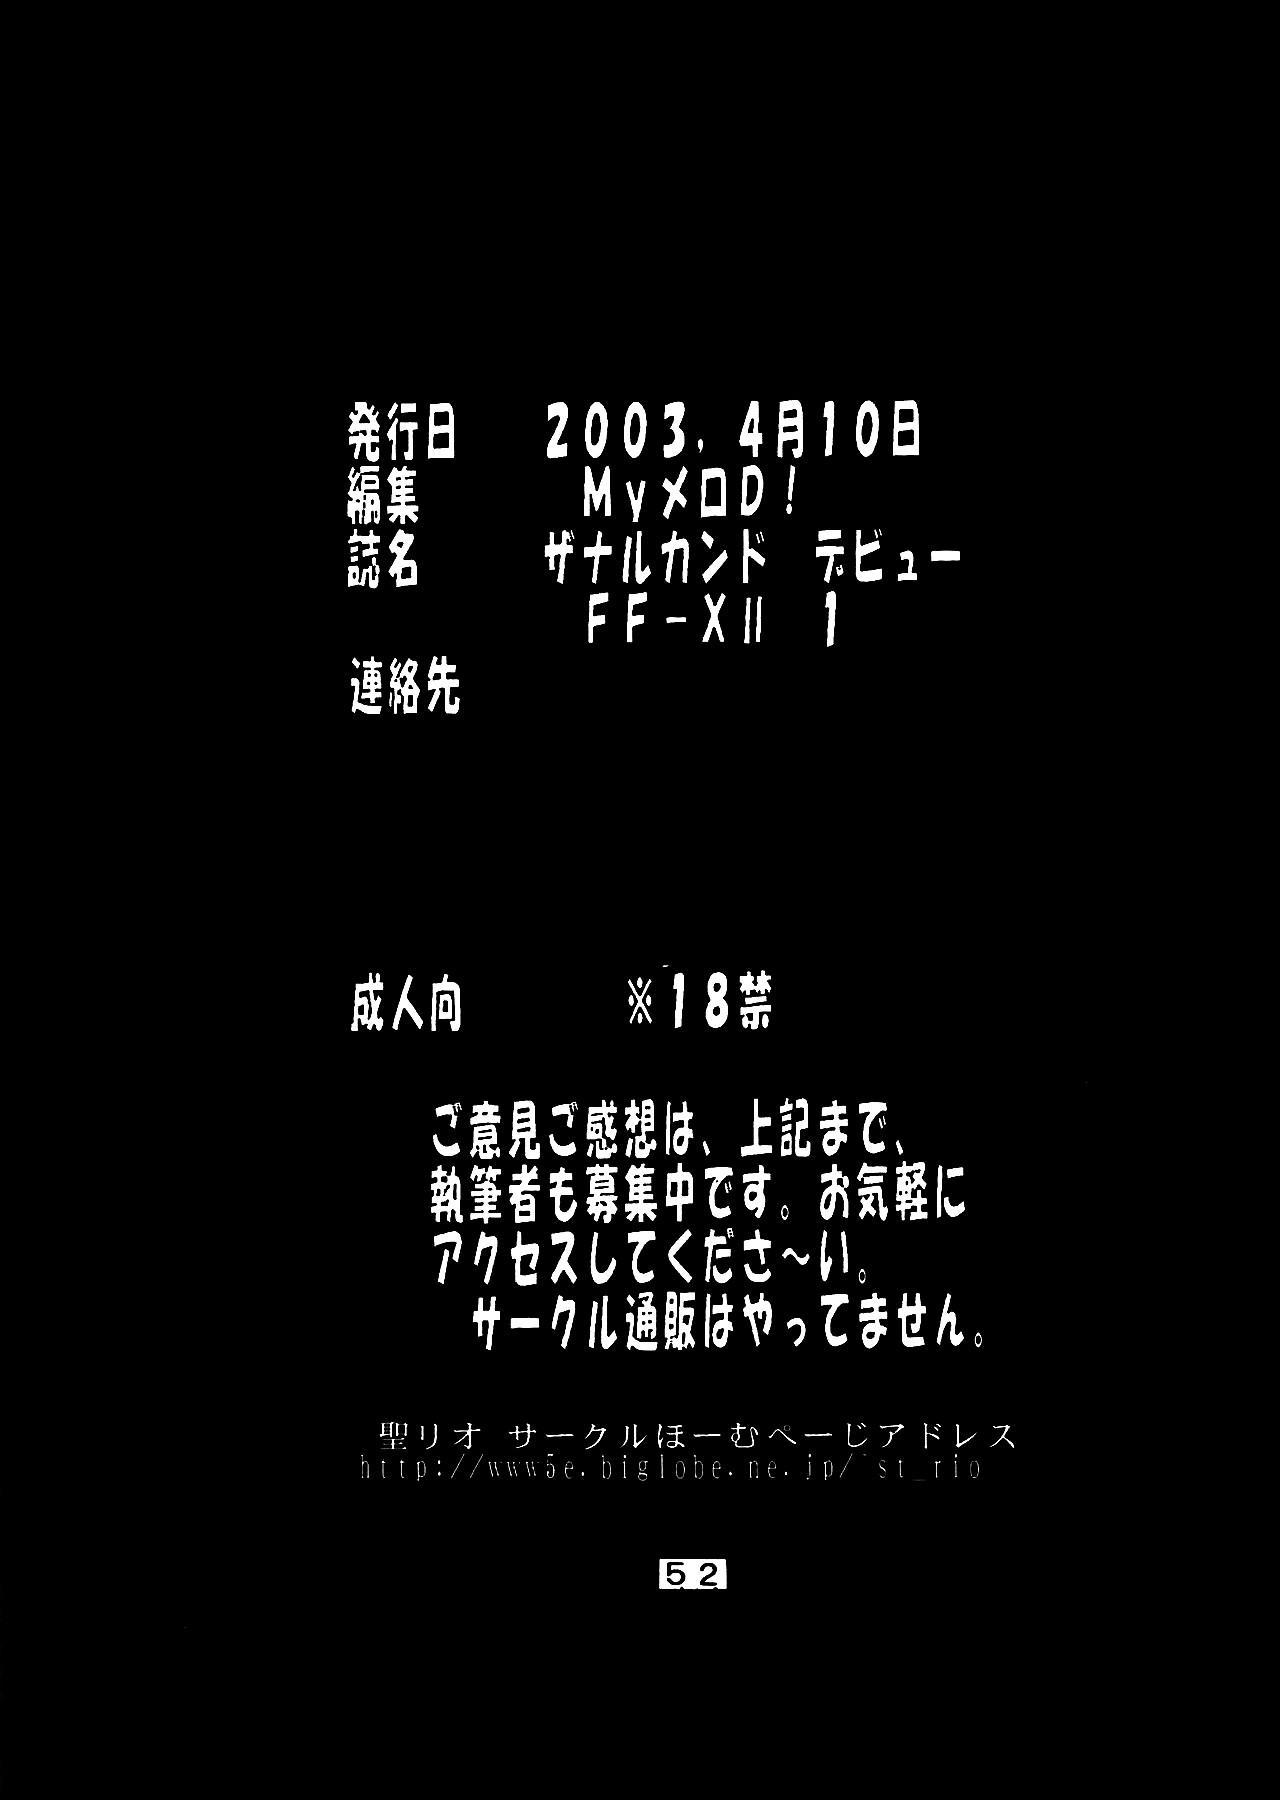 Yuna A La Mode 5 Sphere Hunter Kamomedan XANARKAND DEBUT 52